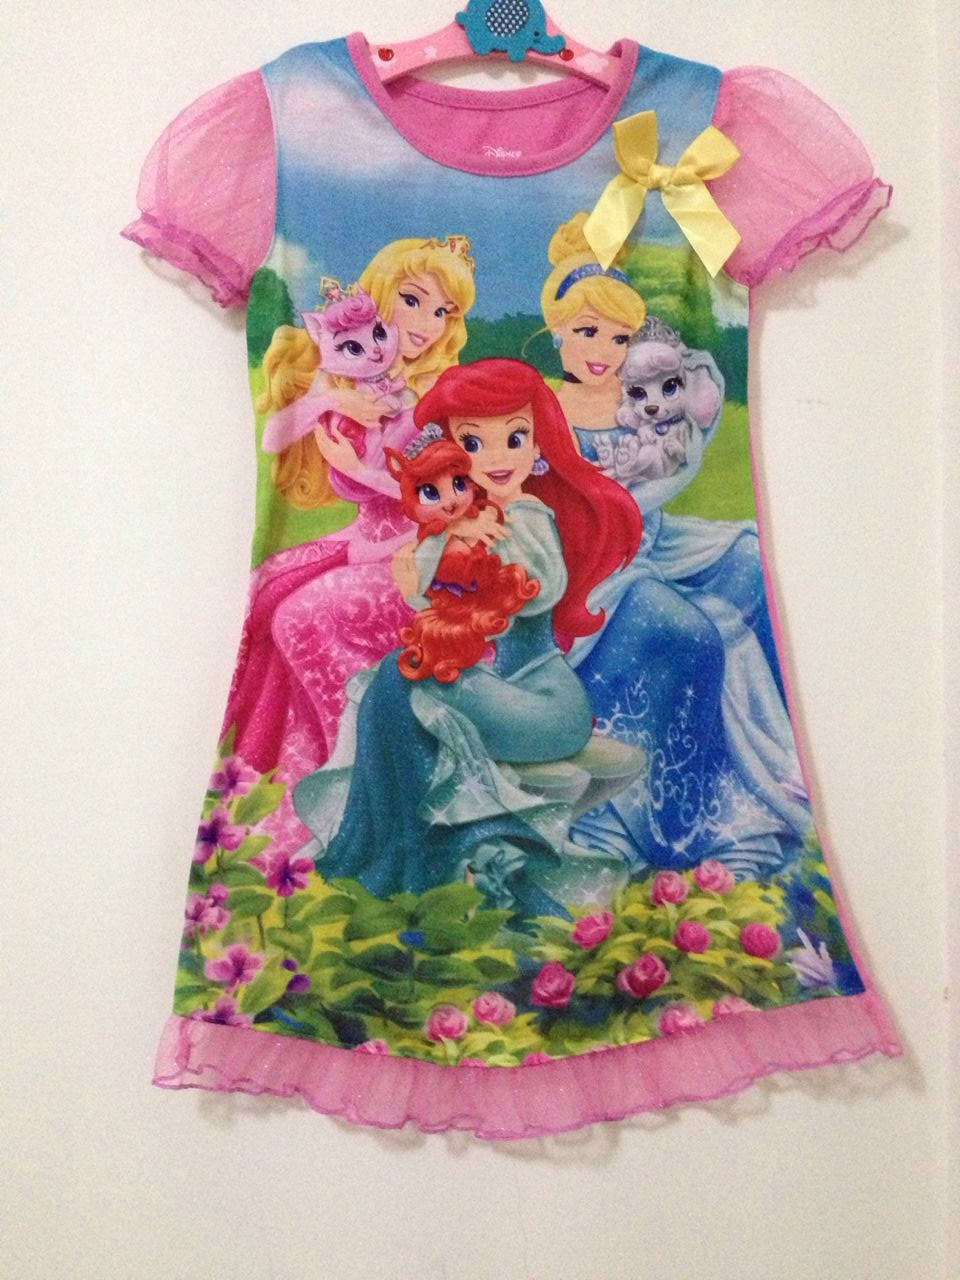 1PC Cartoon Elsa Little Pony Princess Cinderella Girls Dresses Summer Girls Dress Clothes Children Baby Boutique Clothing 0727(China (Mainland))